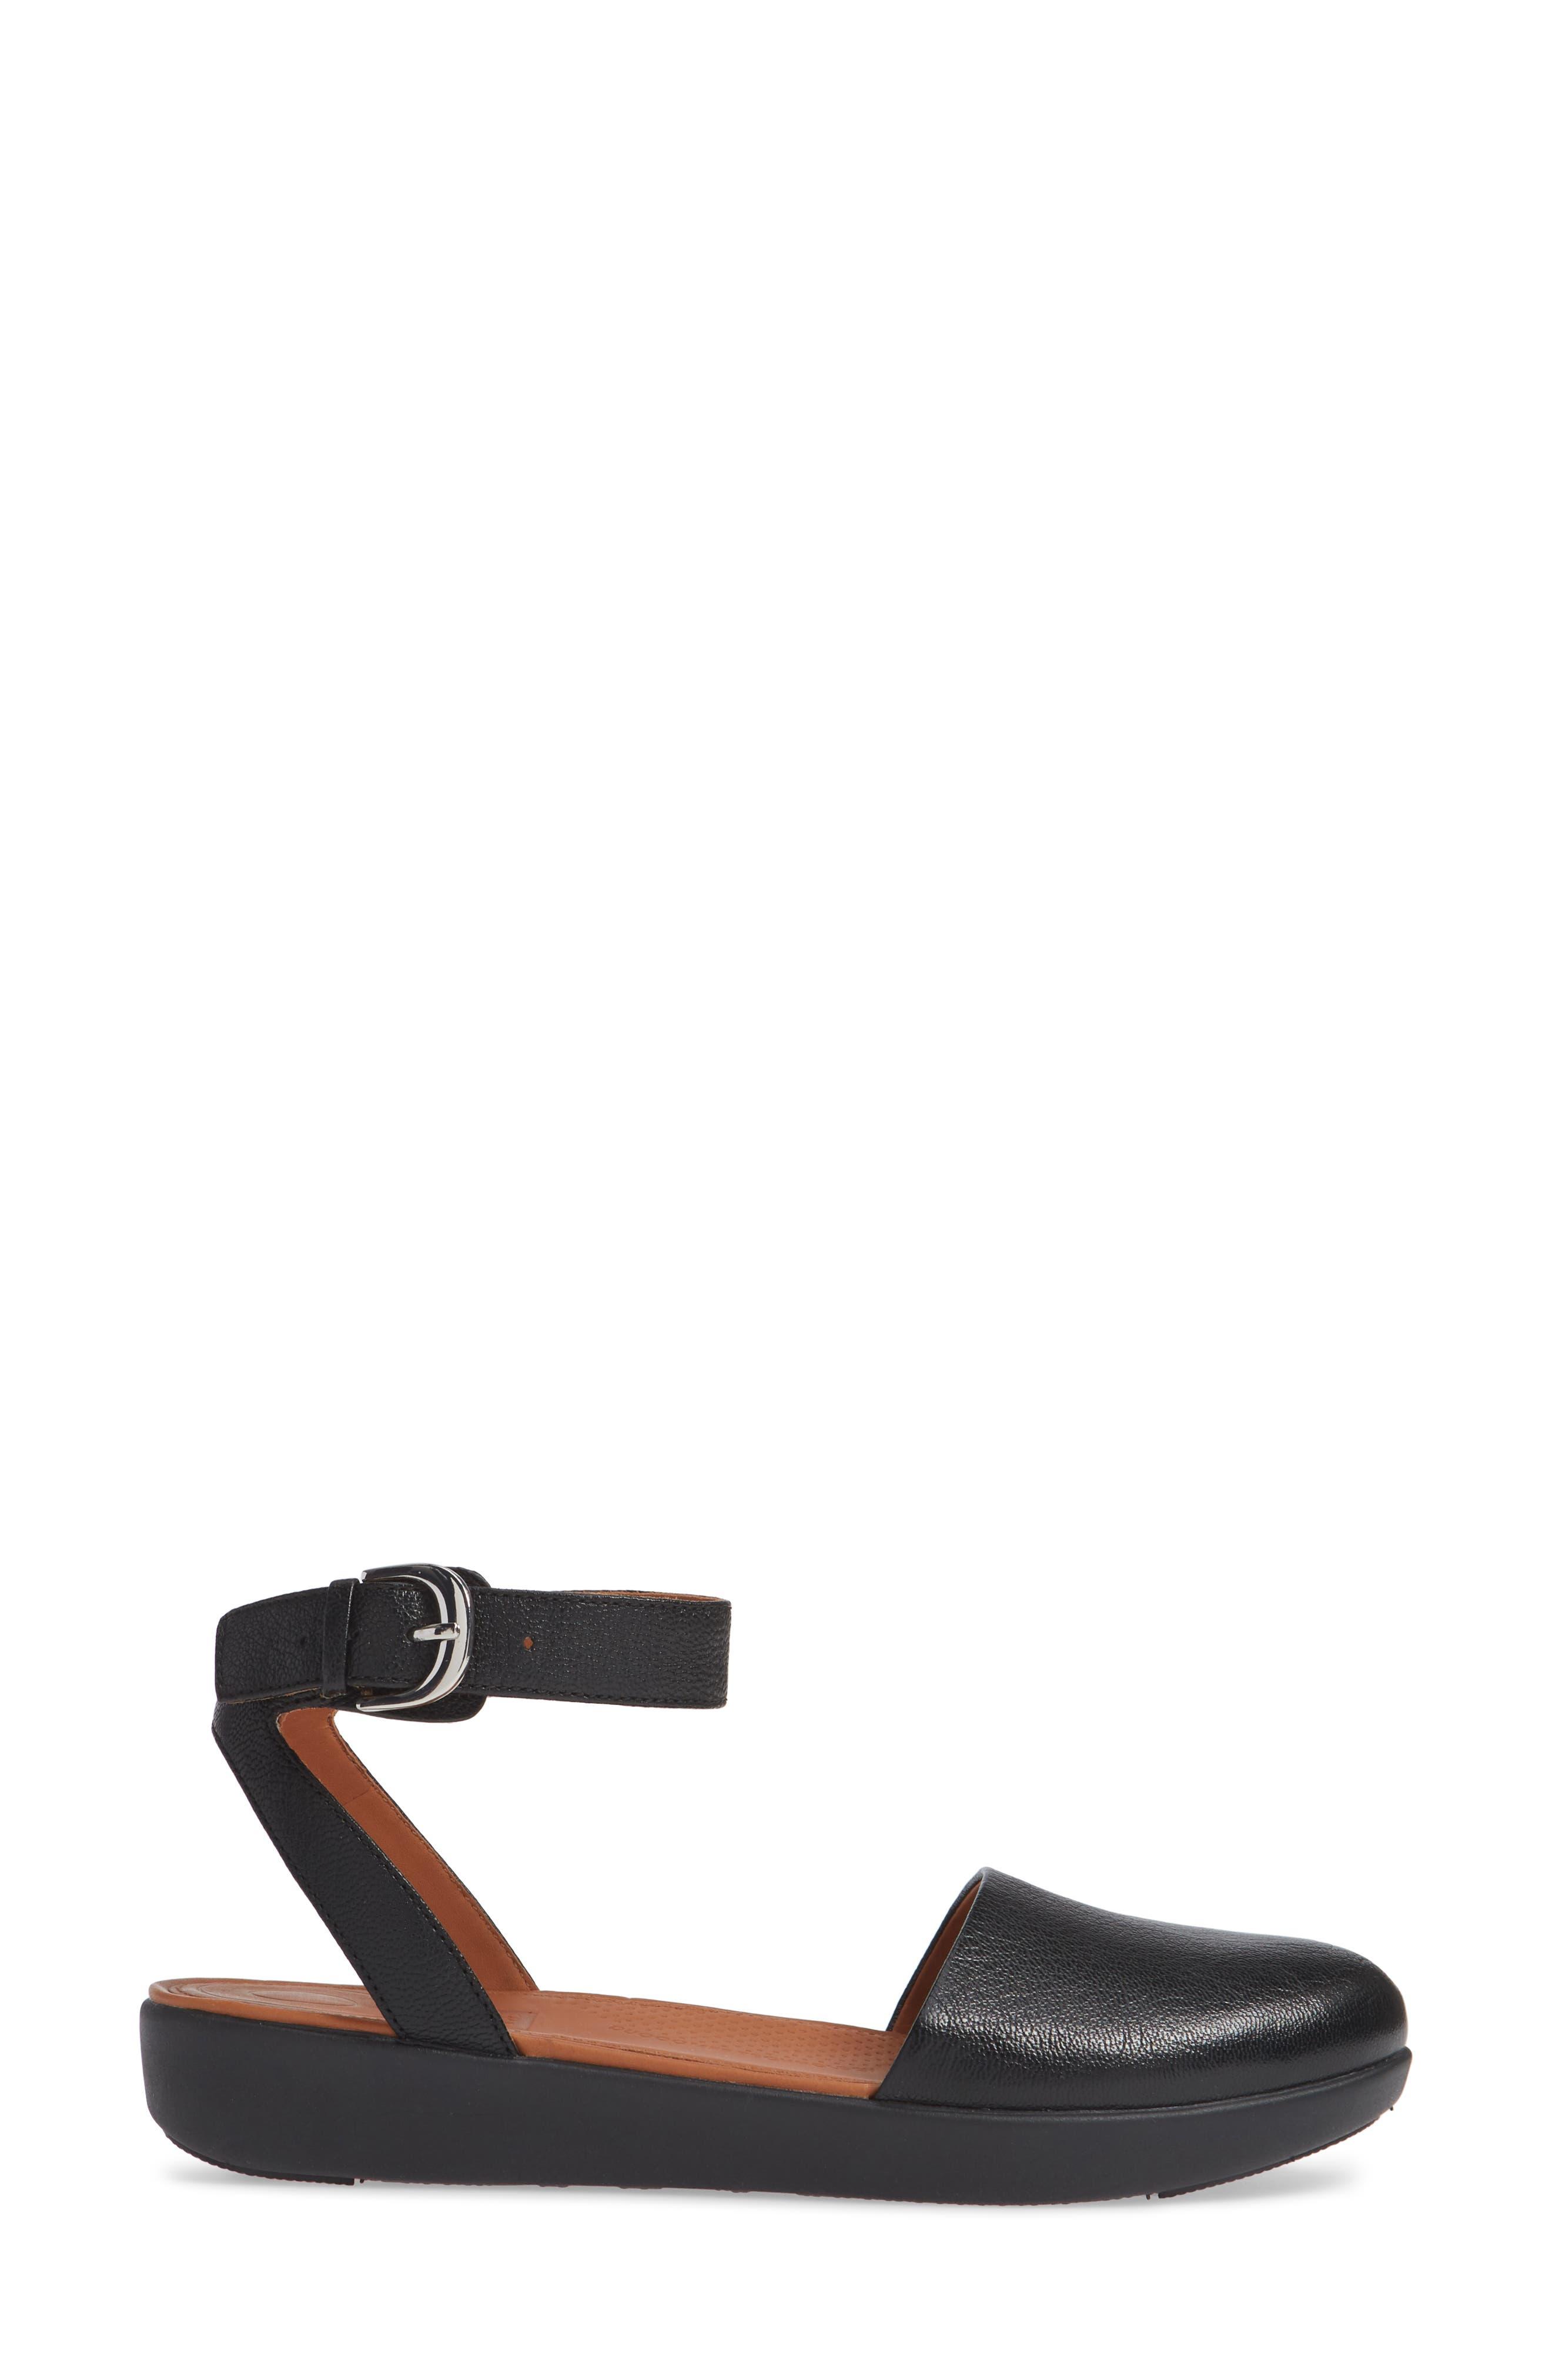 Cova Ankle Strap Sandal,                             Alternate thumbnail 3, color,                             BLACK LEATHER